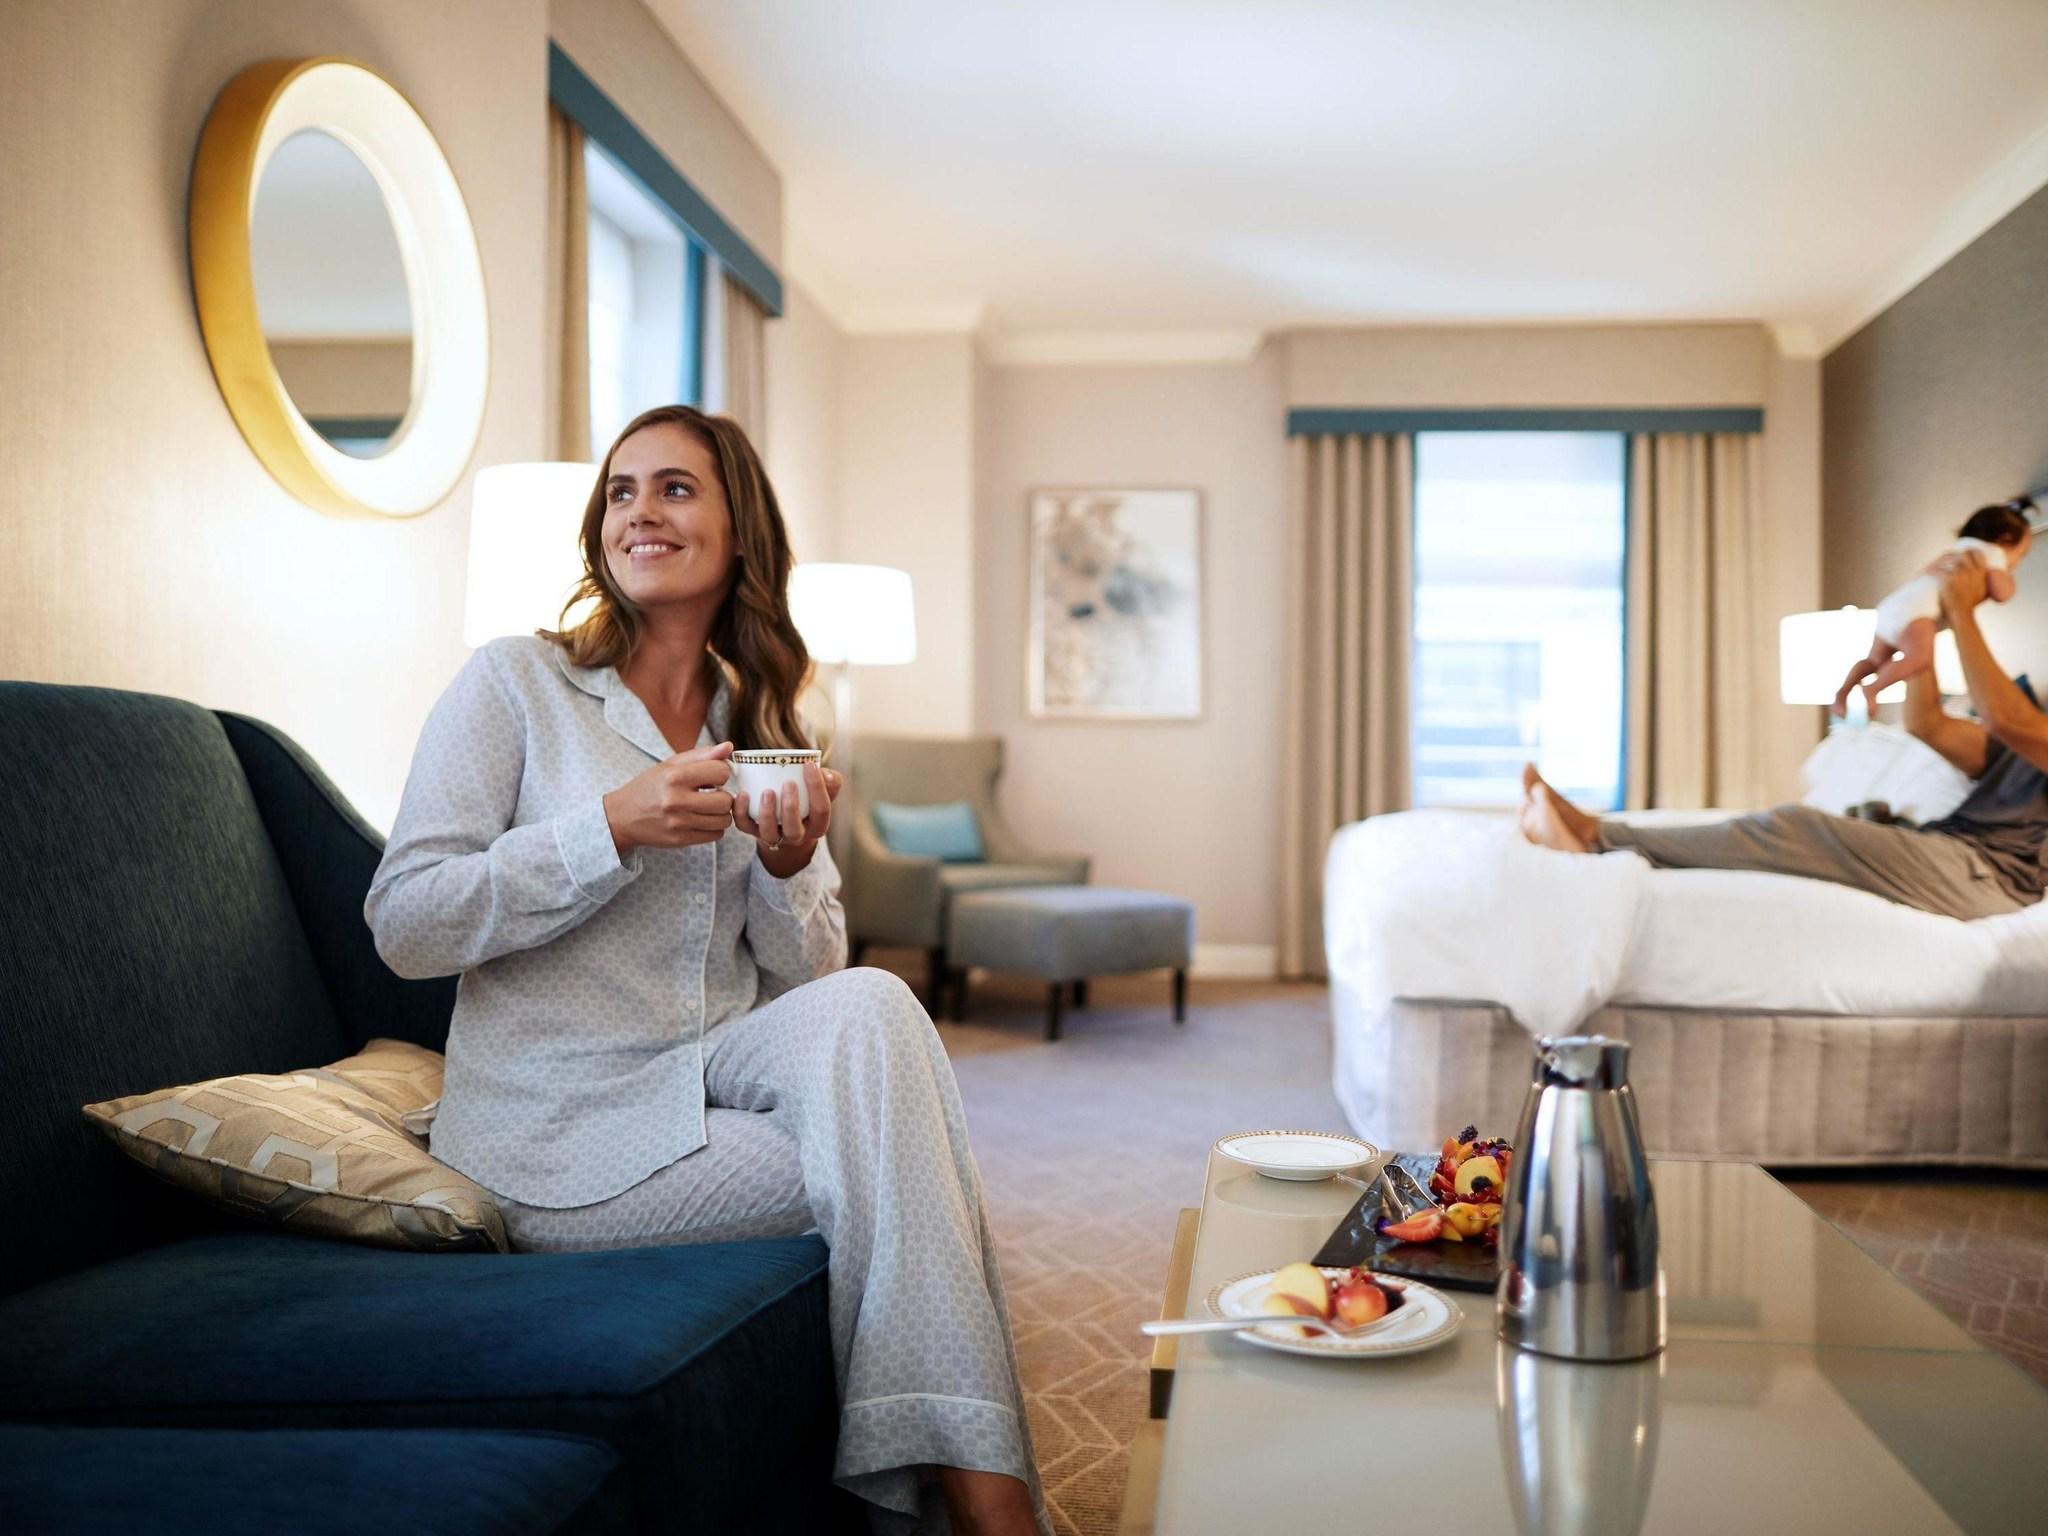 Hotel in SEATTLE - Fairmont Olympic Hotel, Seattle